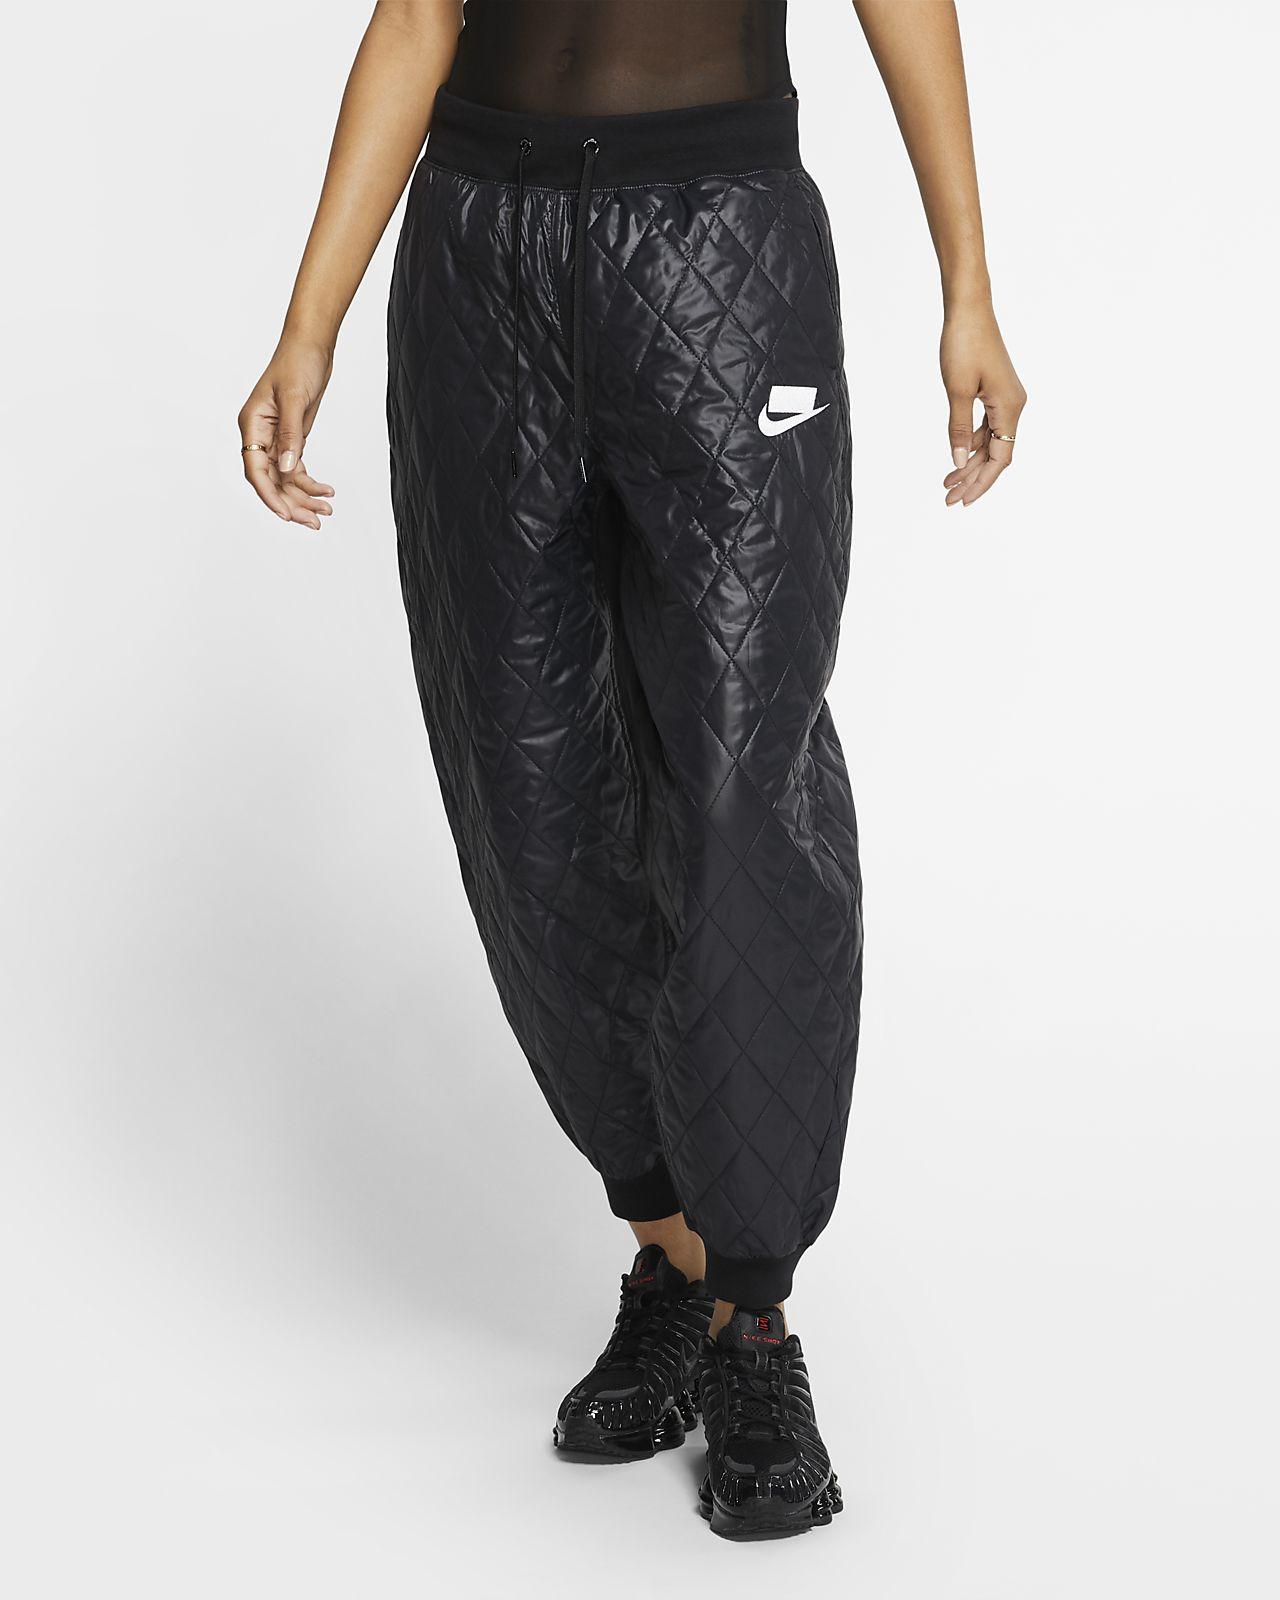 Nike Sportswear Nike Sport Pack Kadın Kapitone Eşofman Altı